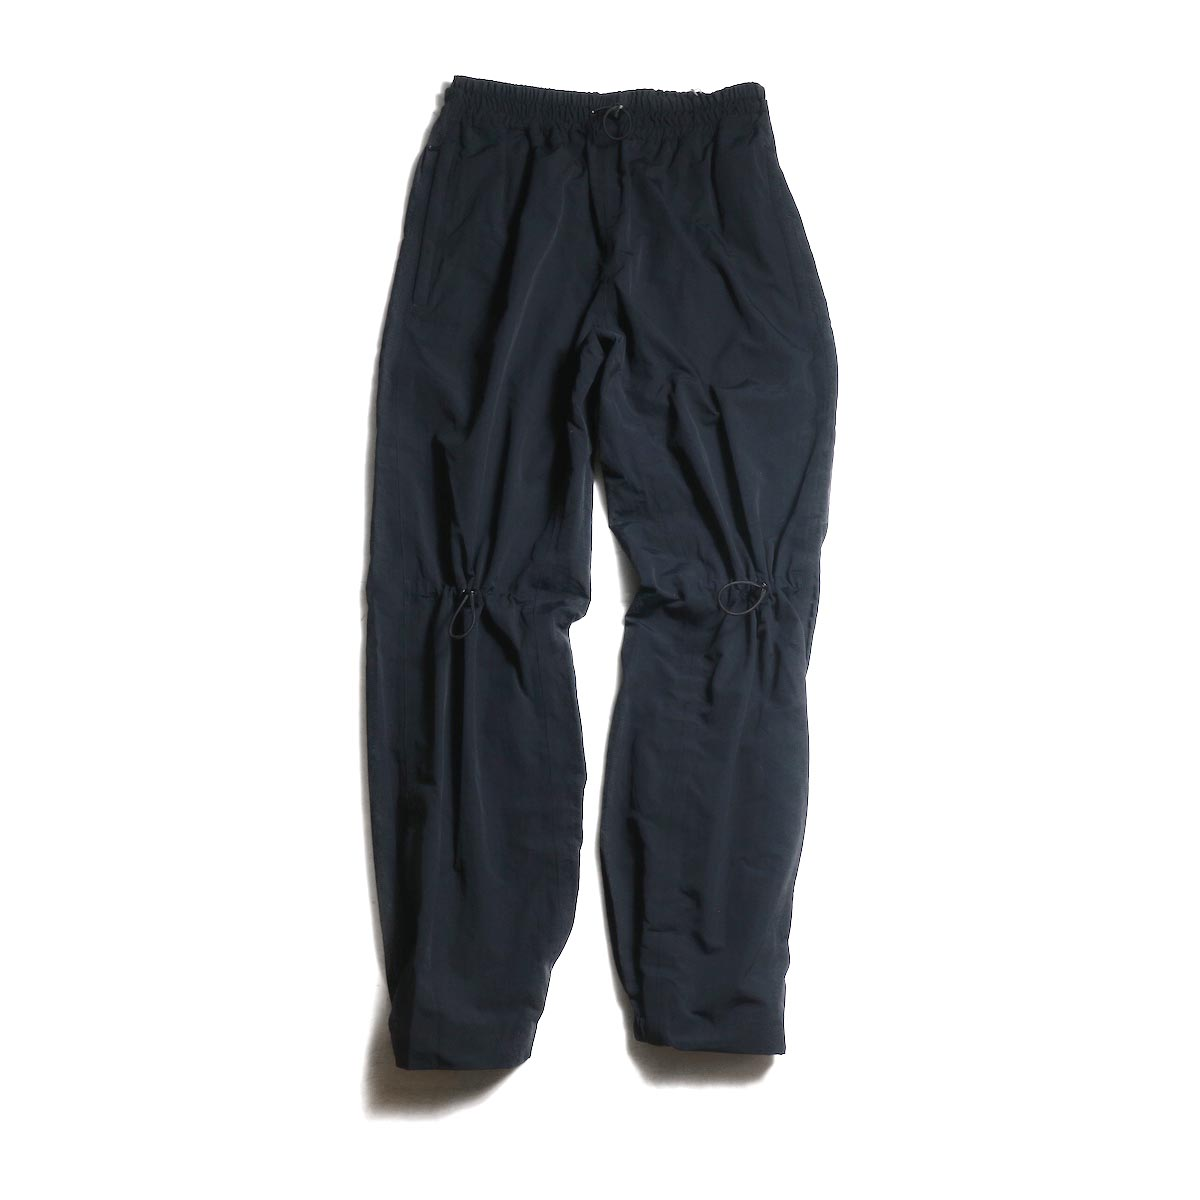 UNUSED / UW0792 Nylon Pants (Black)